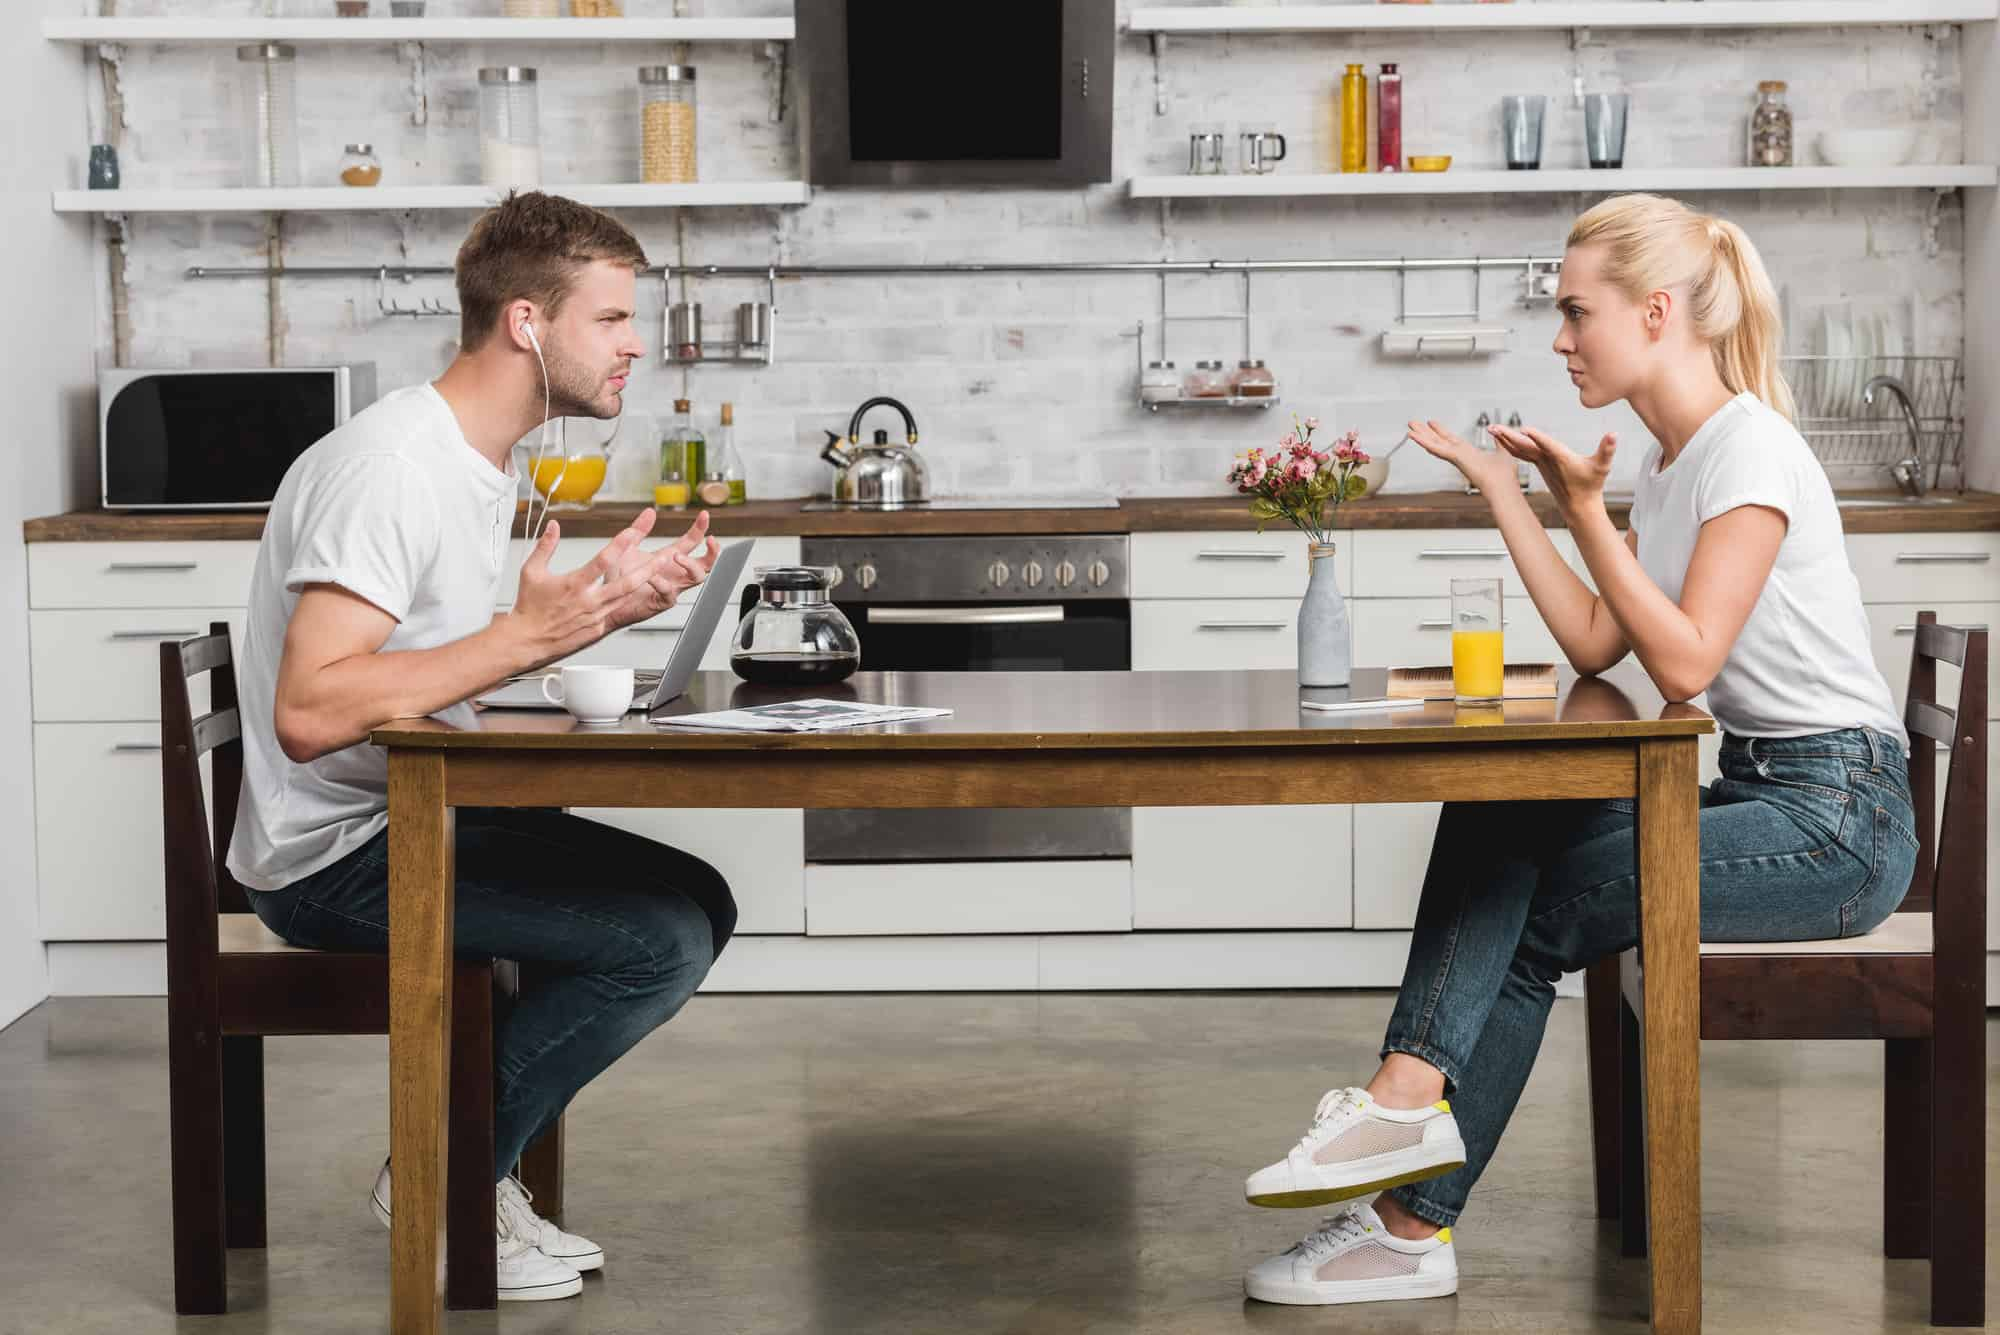 Selfish Husband (9 Top Tips To Deal With A Selfish Husband